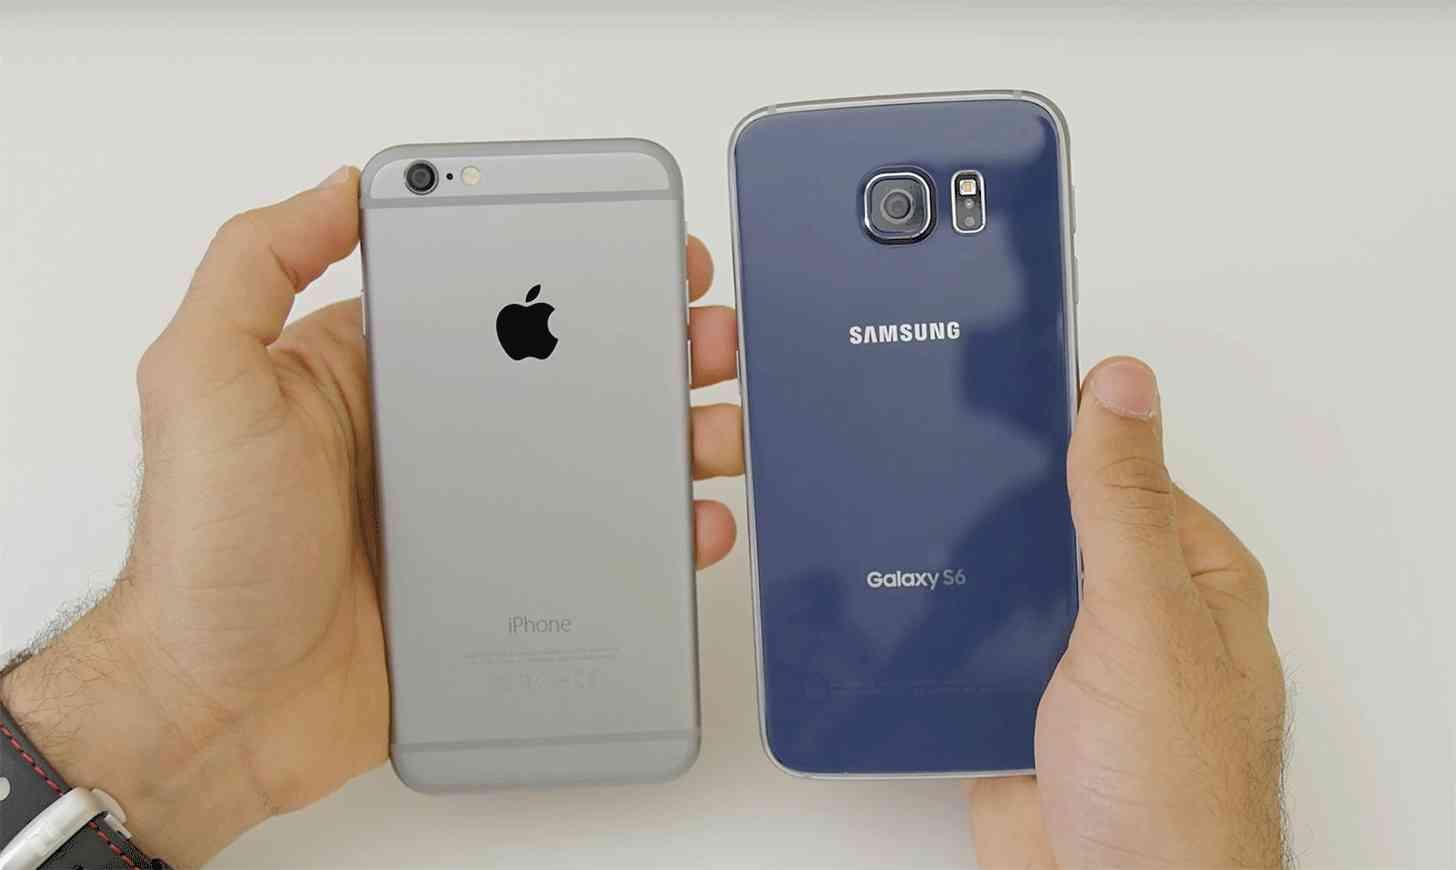 iPhone 6 Galaxy S6 pair